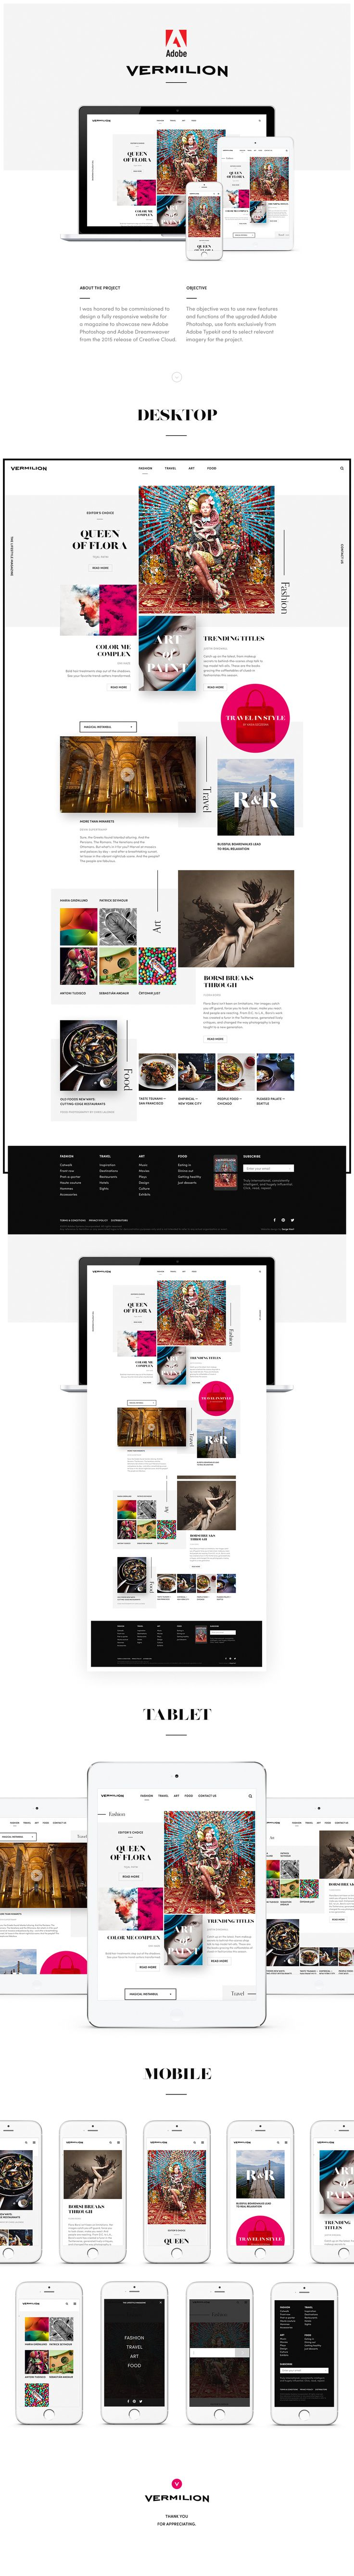 Official Showcase Website for Adobe on Behance